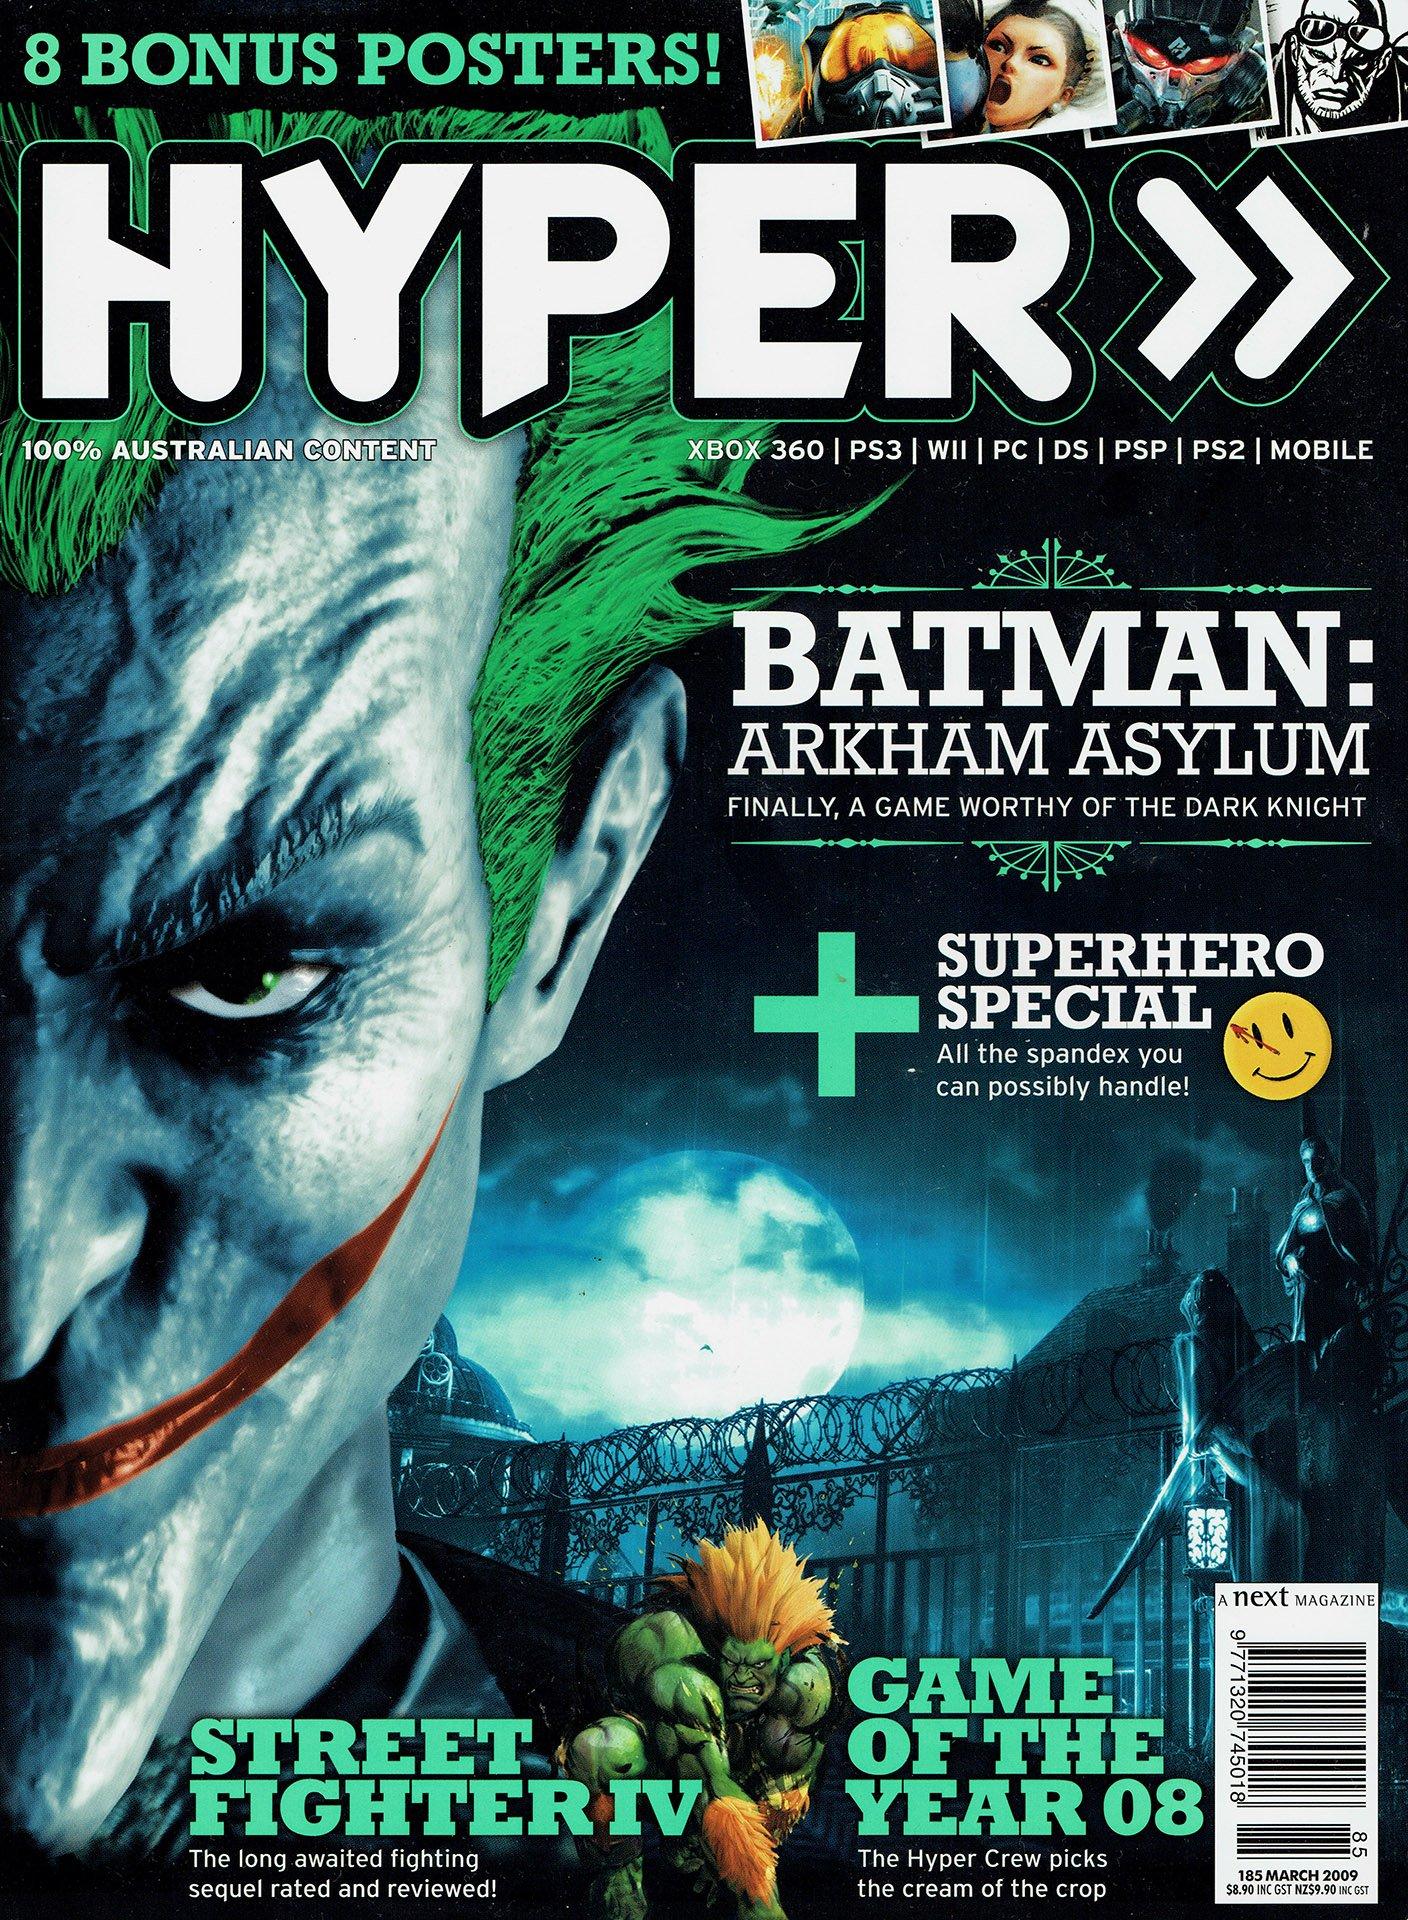 Hyper 185 (March 2009)